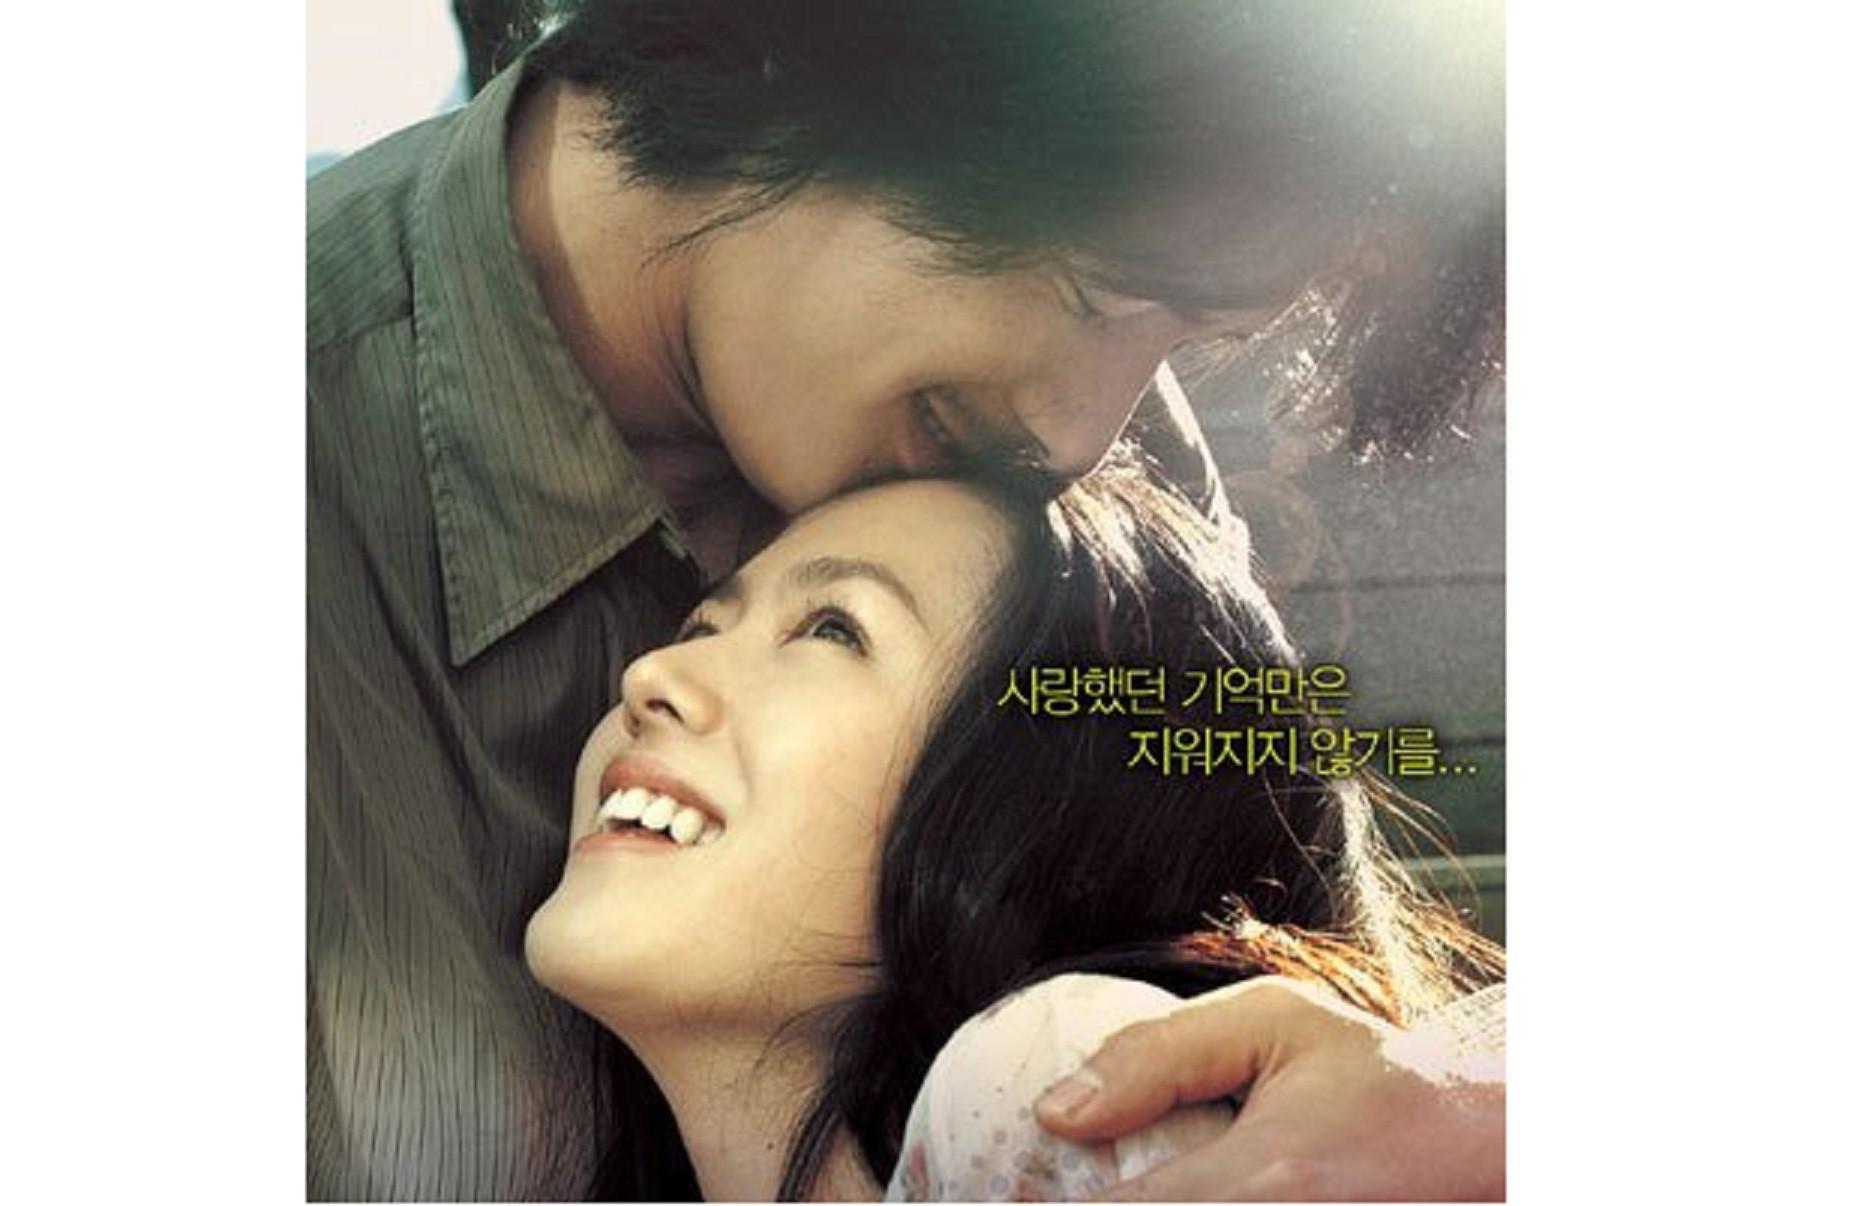 6 Film Korea Super Romantis Ini Wajib Ditonton Penggemar K-Drama